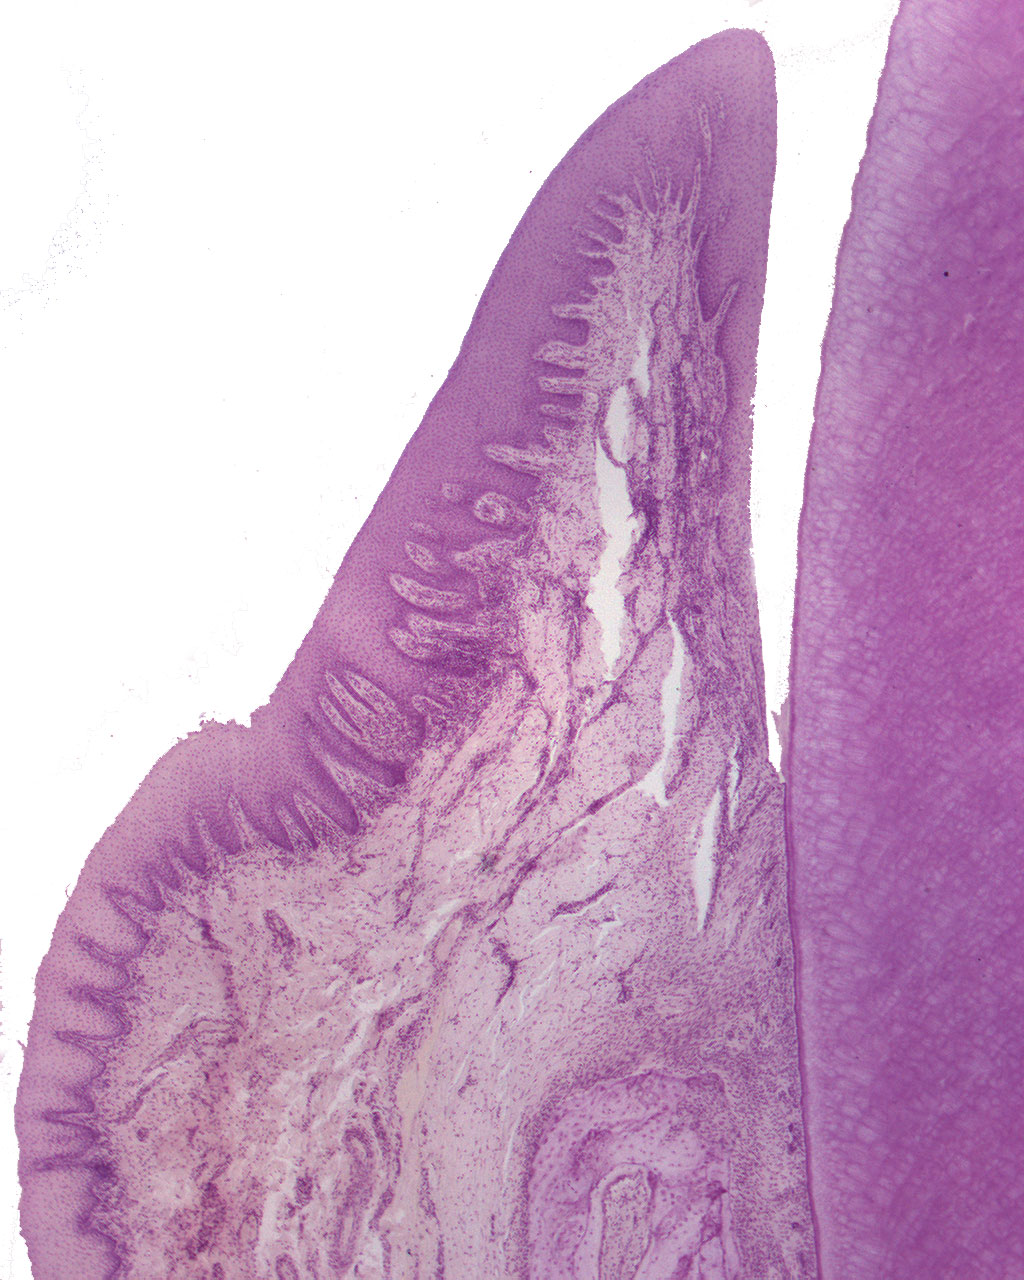 Microimage